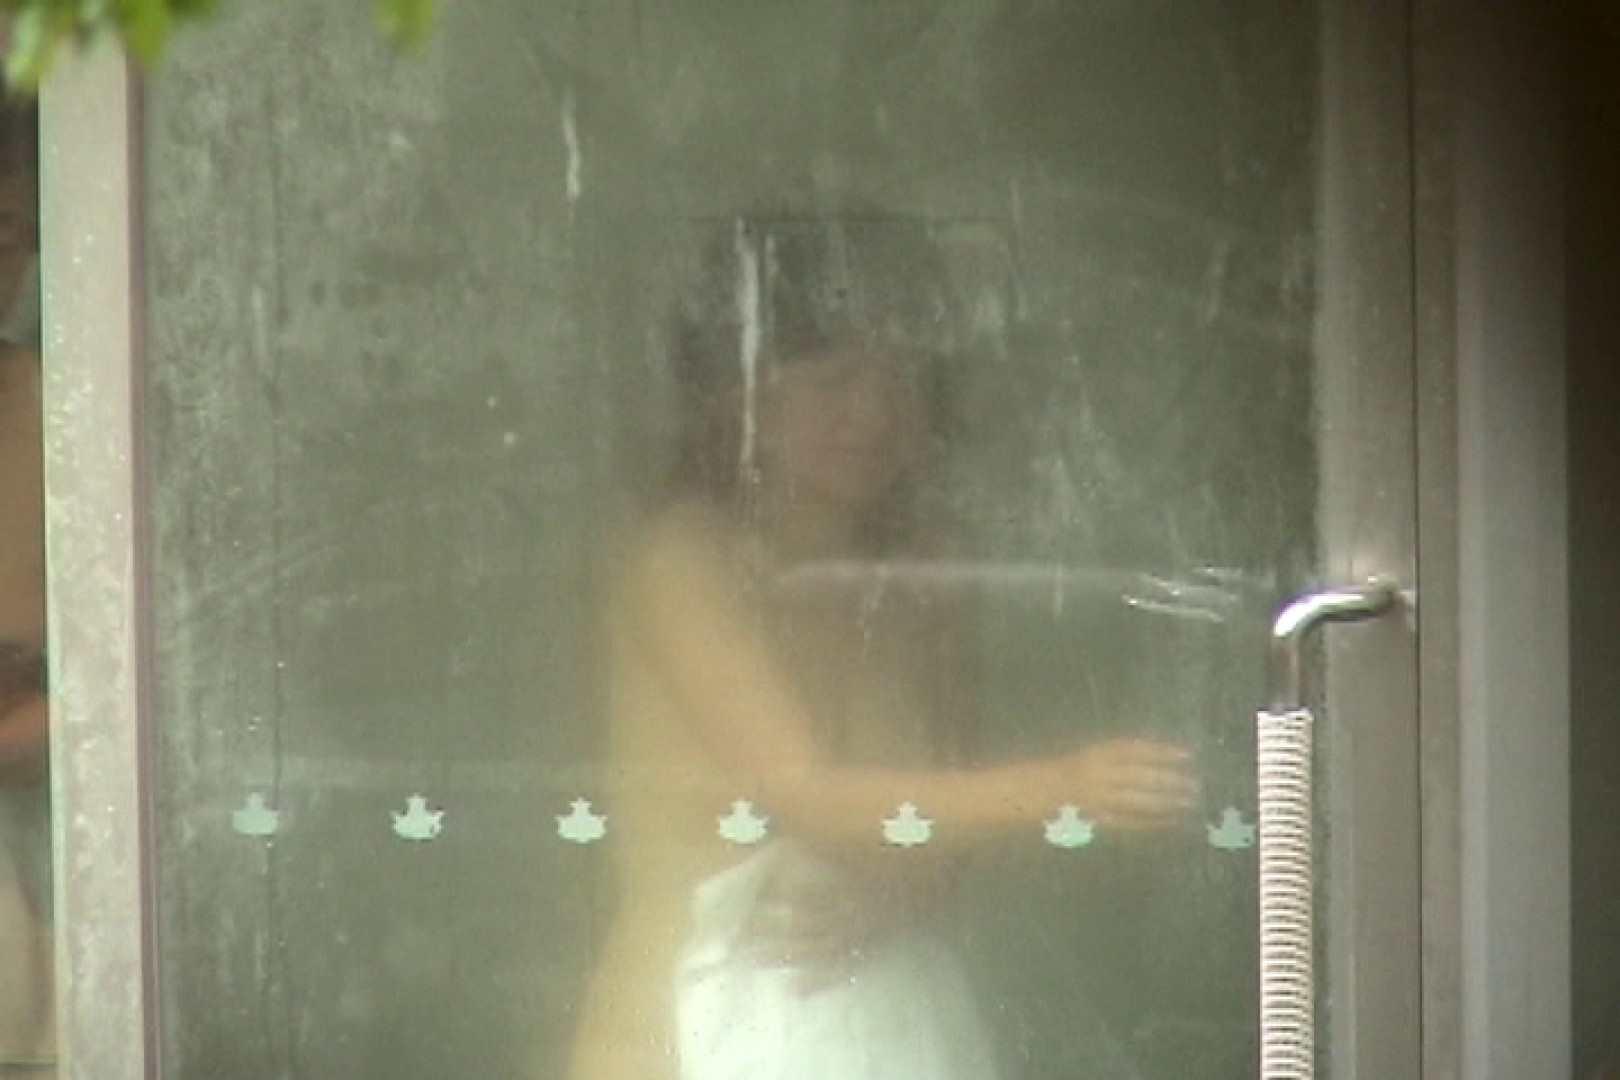 Aquaな露天風呂Vol.456 盗撮師作品 | 露天風呂突入  88pic 67